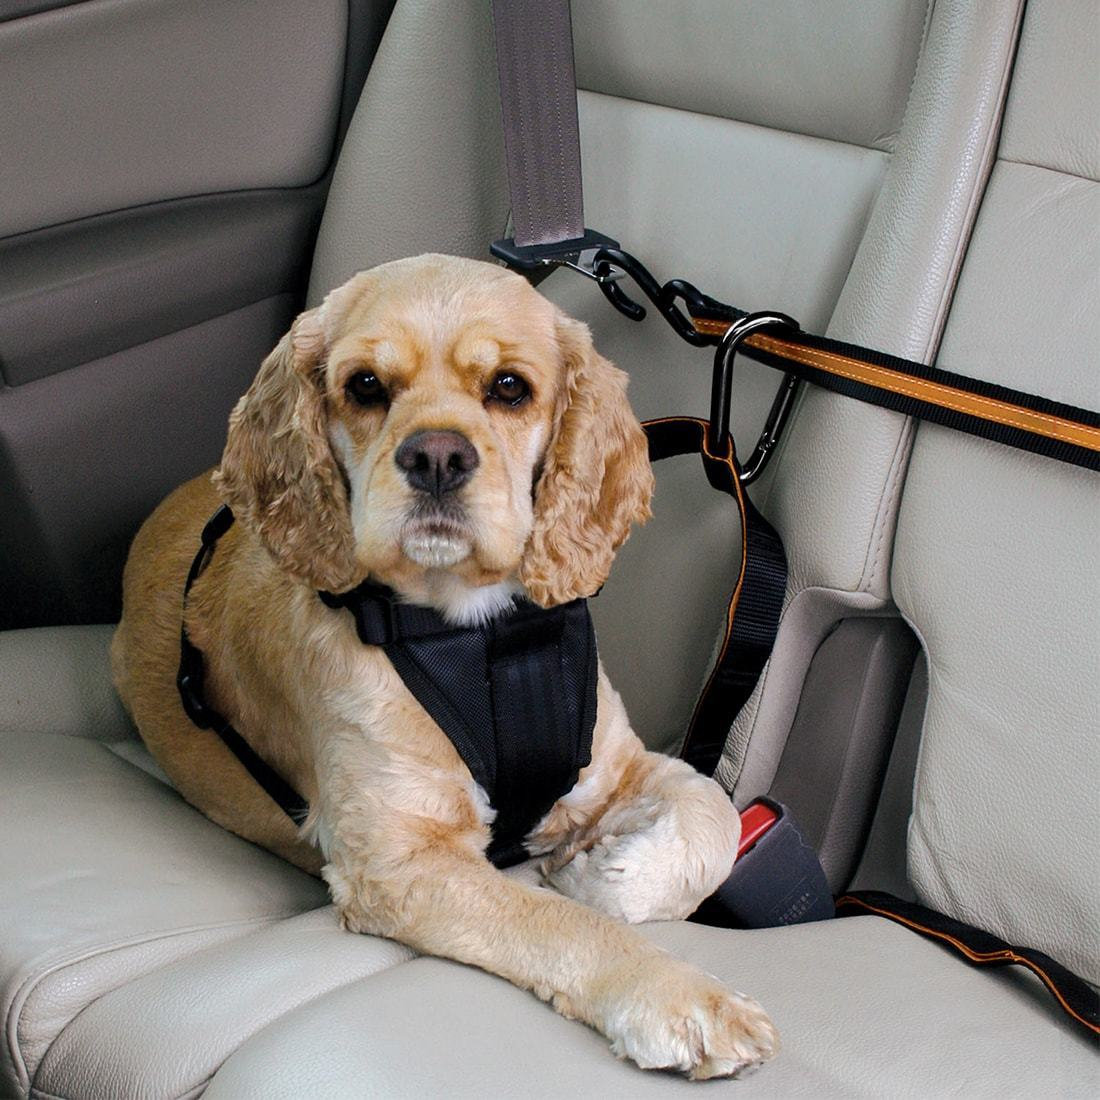 kg-dog-car-zip-line-restraint-2.jpg